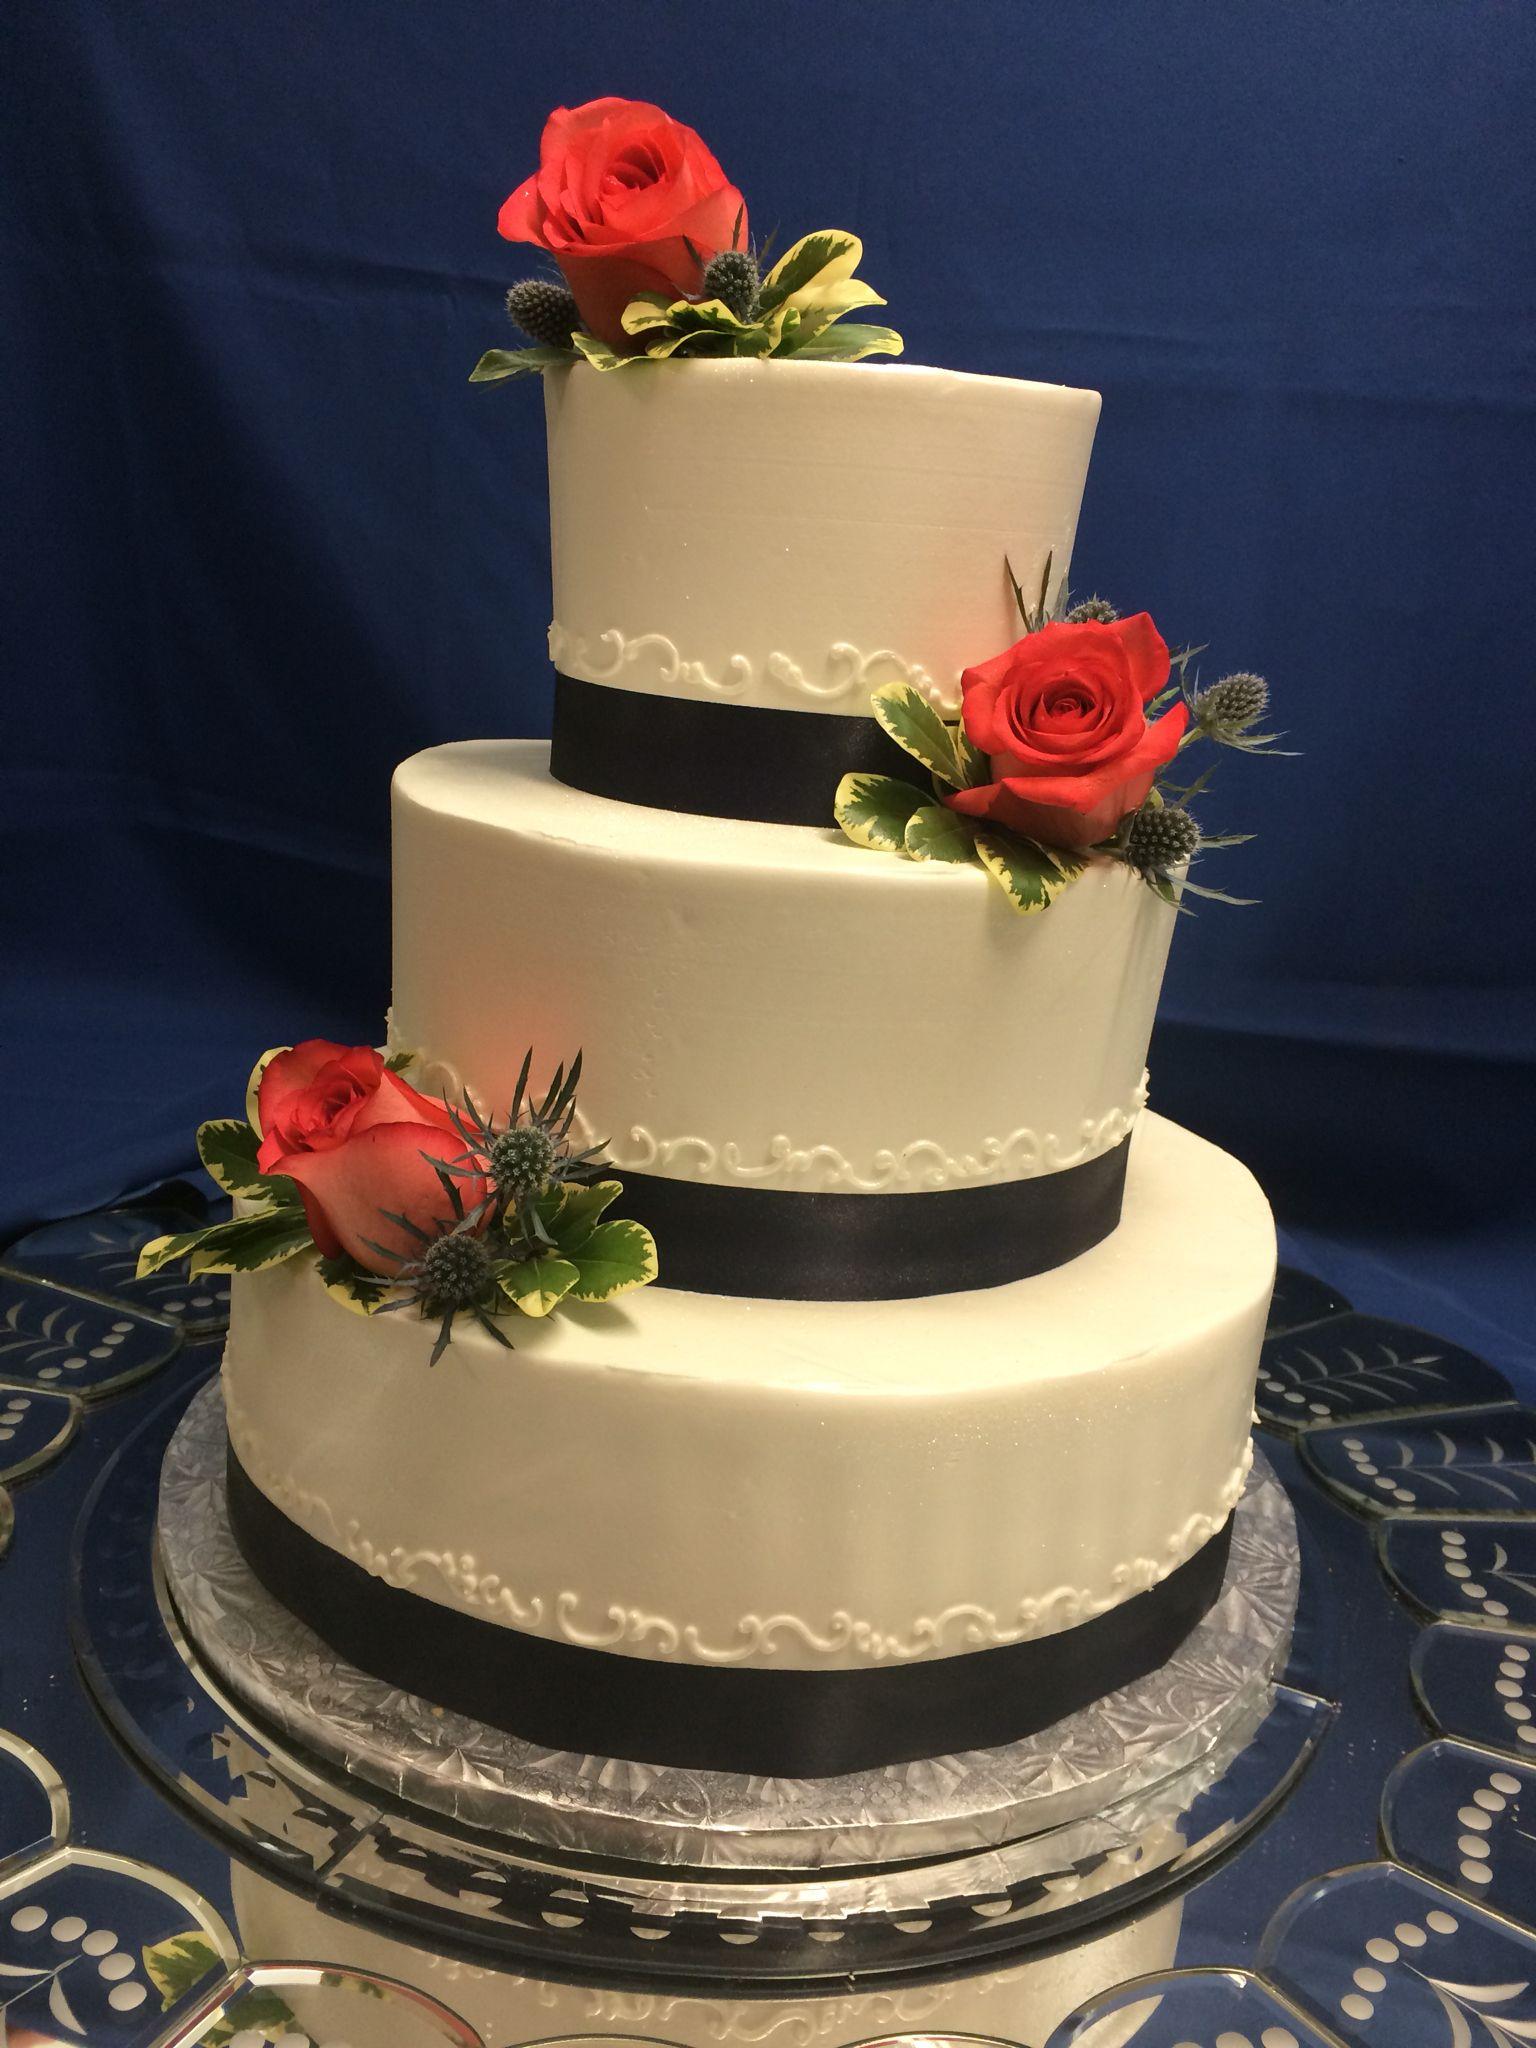 Navy Blue and Coral | Wedding Cakes | Pinterest | Wedding cake ...